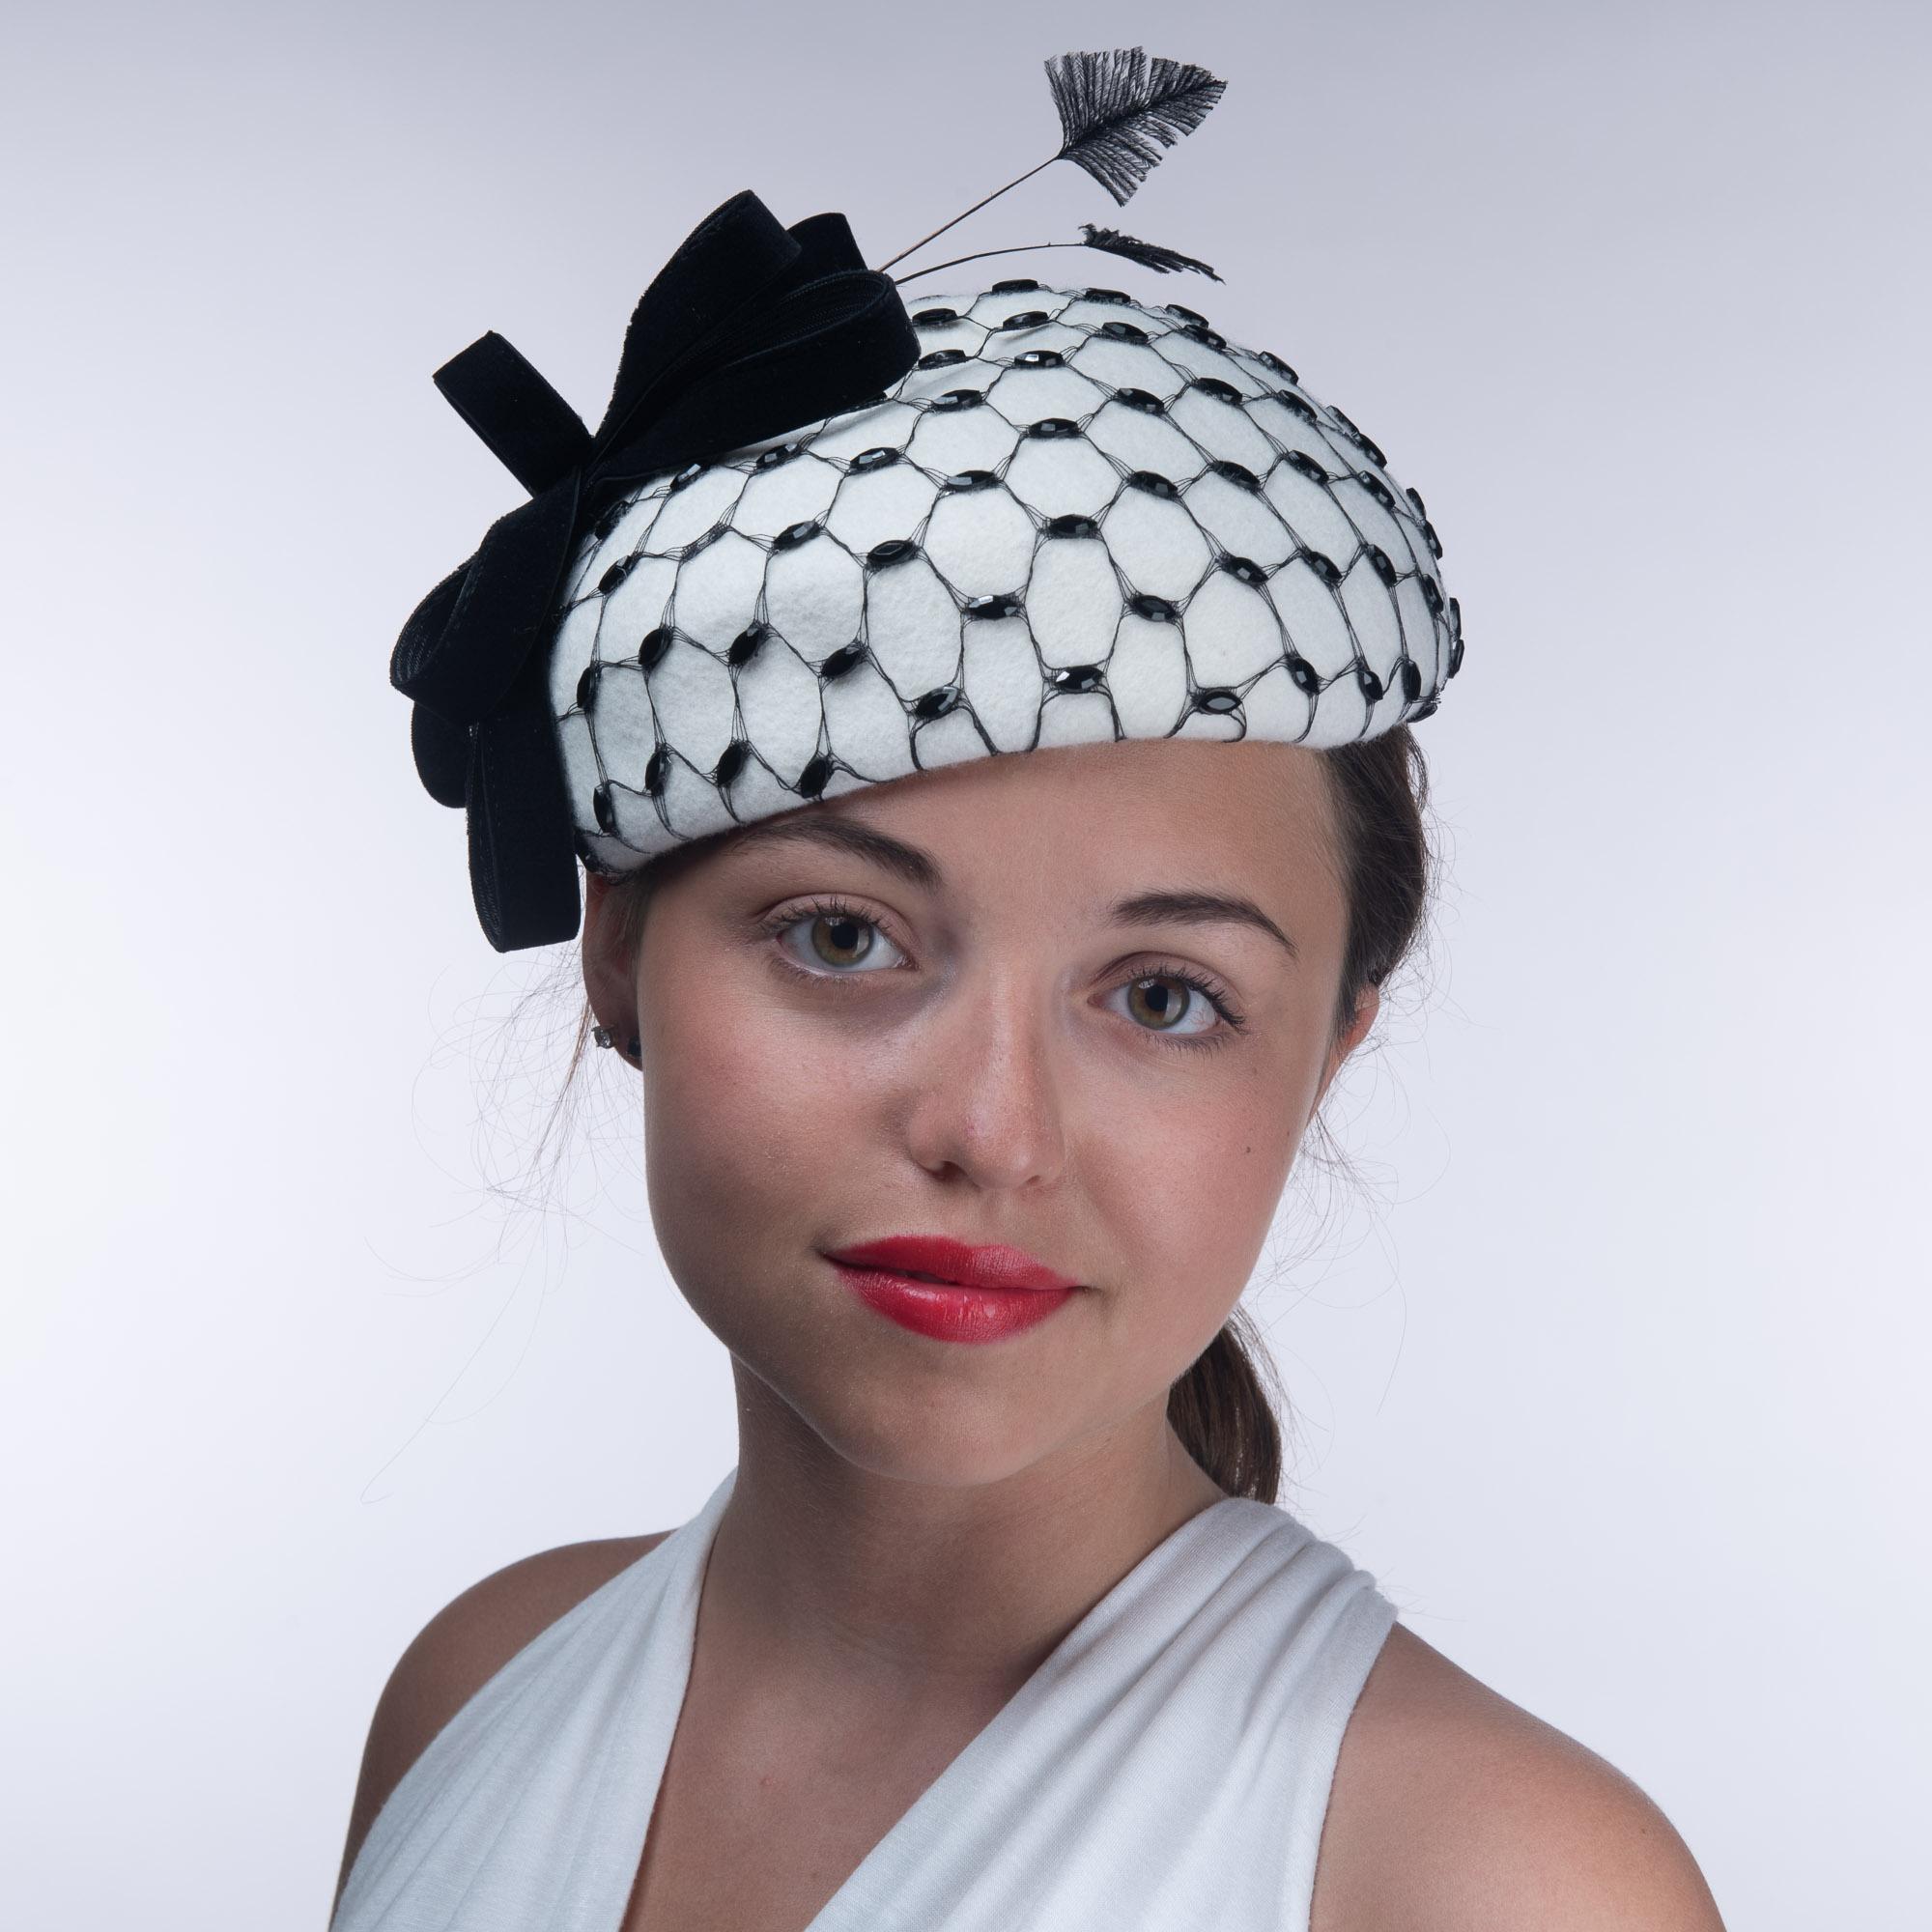 5dfeecaf3e566 Winter White And Black Rhinestone Veil Wool Felt Pillbox Hats - Sun Yorkos